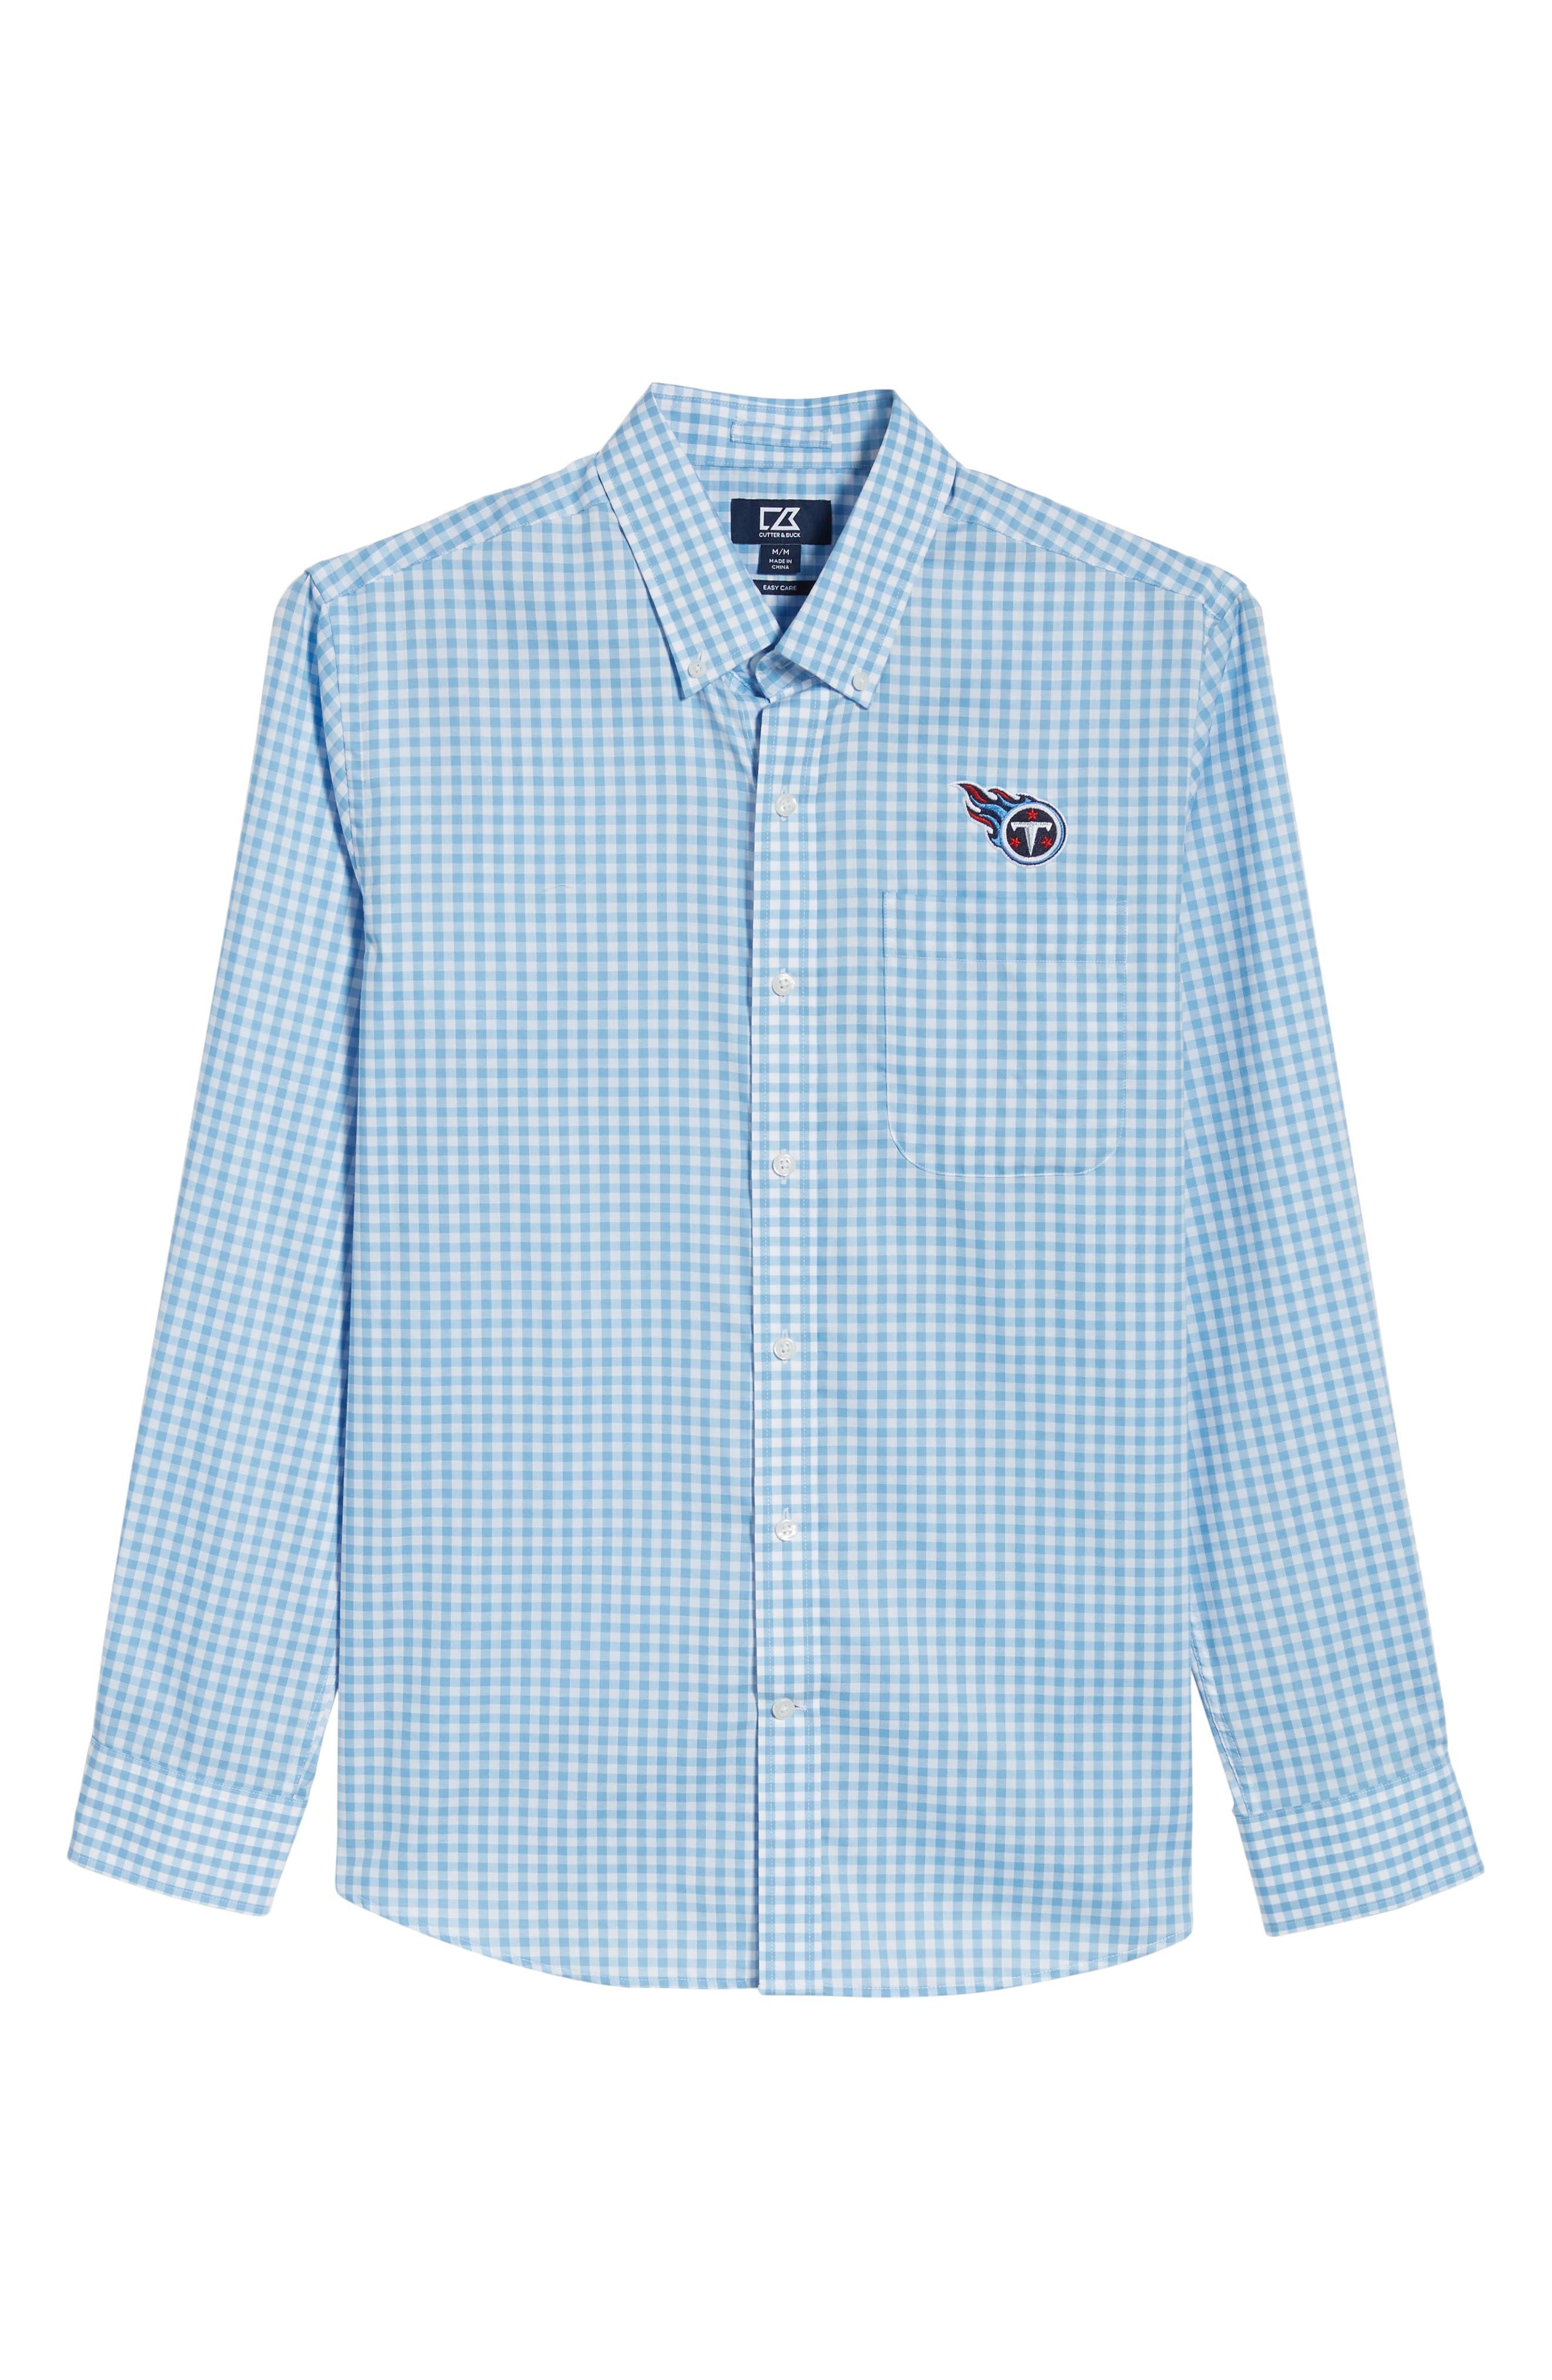 Tennessee Titans - League Regular Fit Sport Shirt,                             Alternate thumbnail 6, color,                             ATLAS